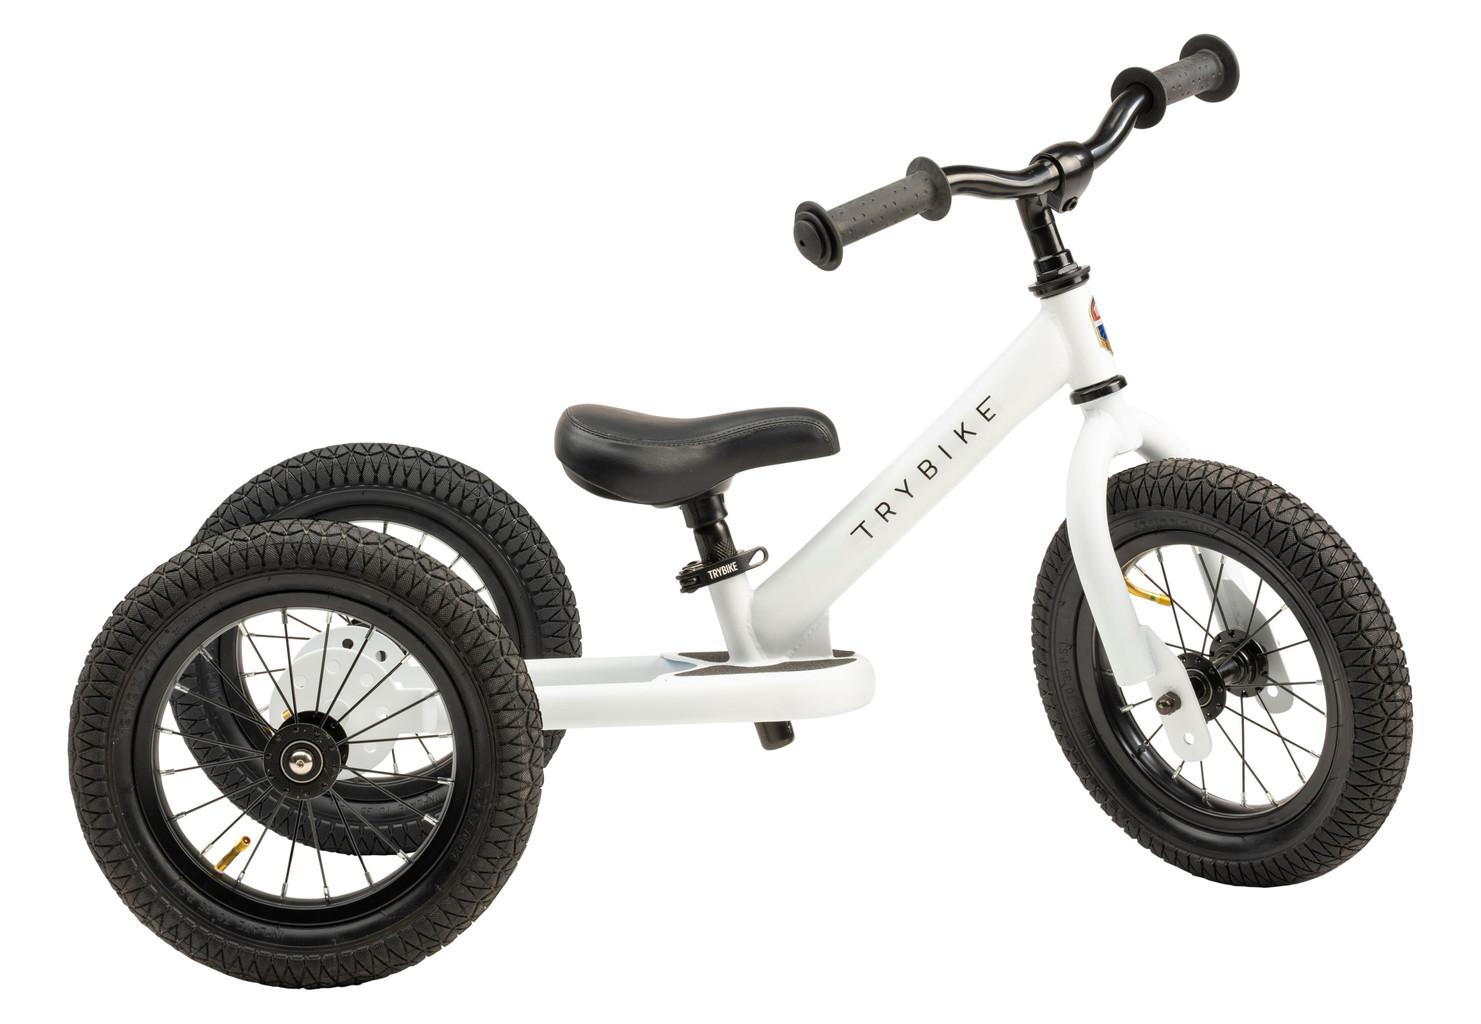 Trybike - 3 hjulet Løbecykel, Hvid | løbecykel og løbehjul